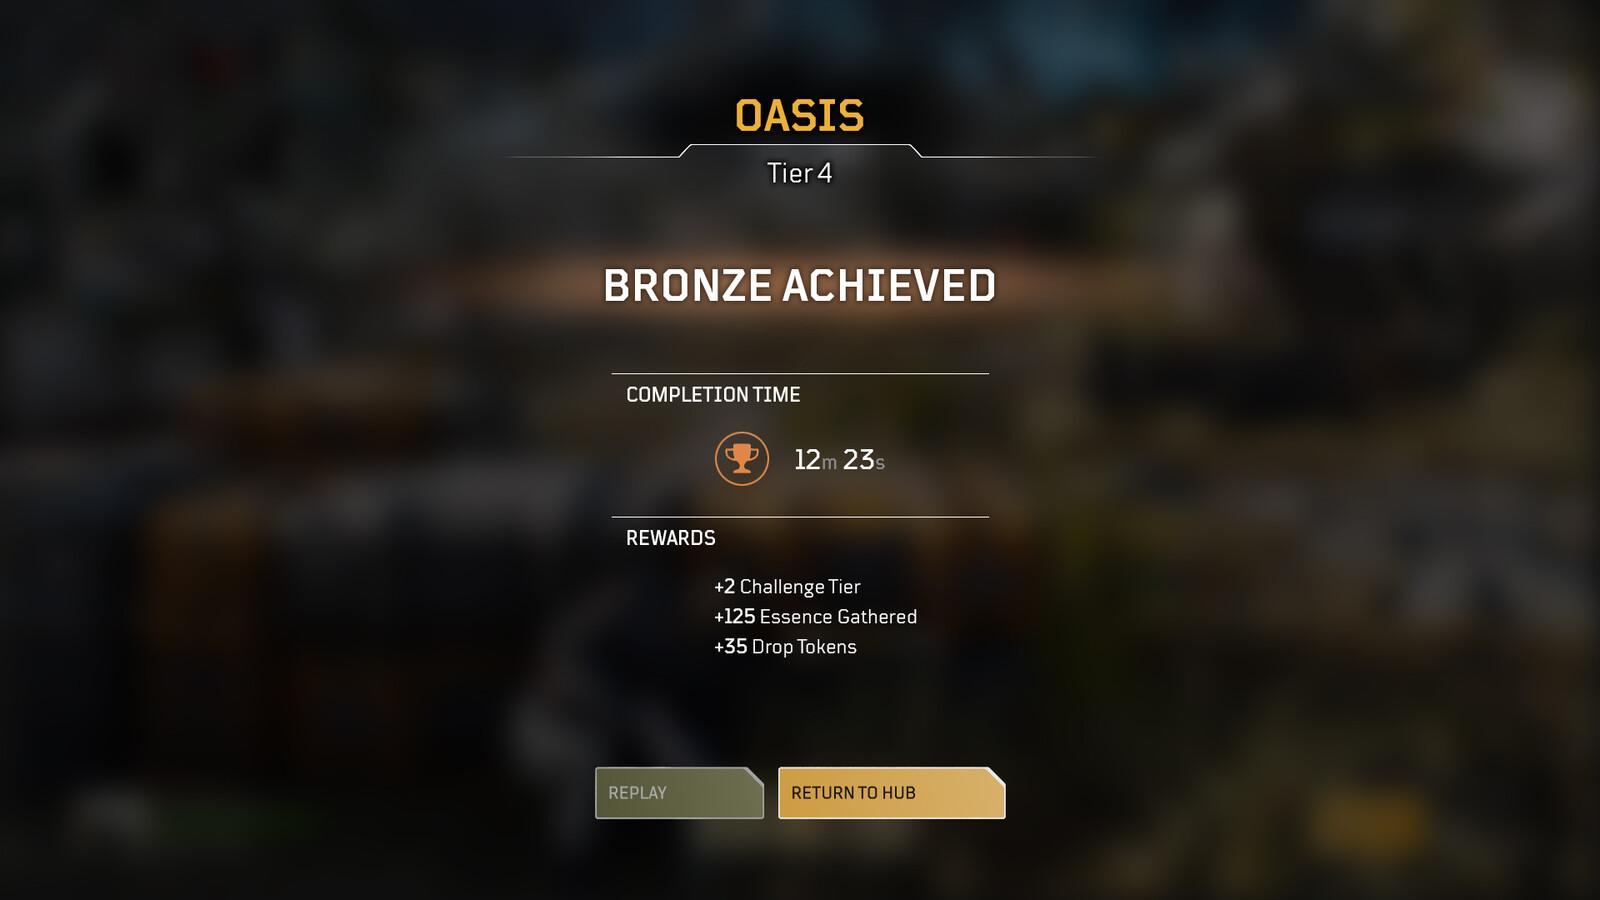 Design for the challenge screen - rewards